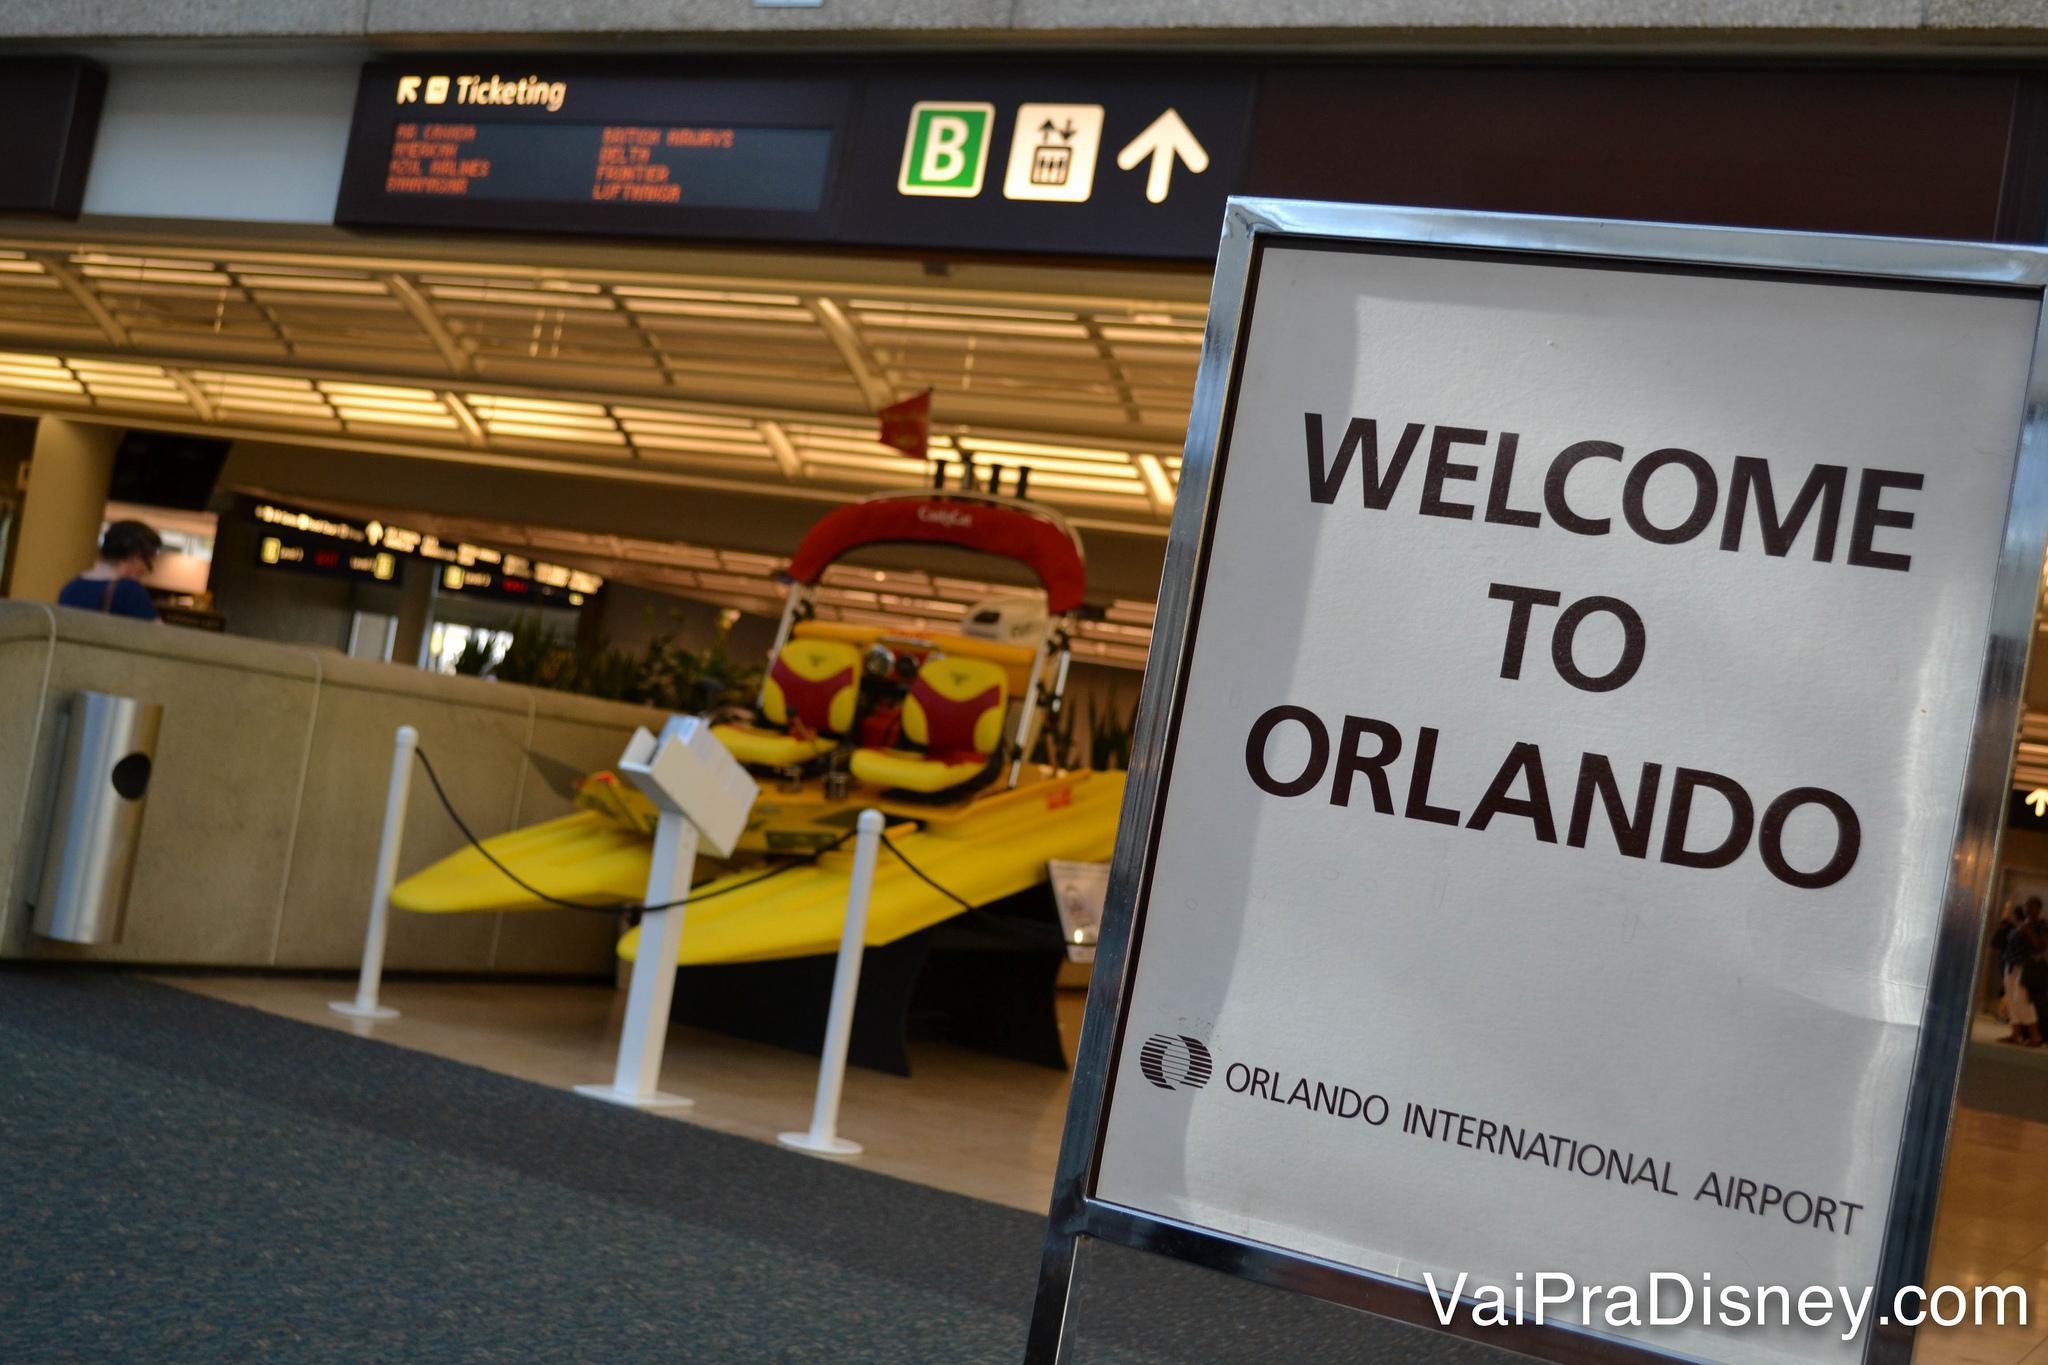 db6363e97 Chegando no aeroporto de Orlando - Vai pra Disney?